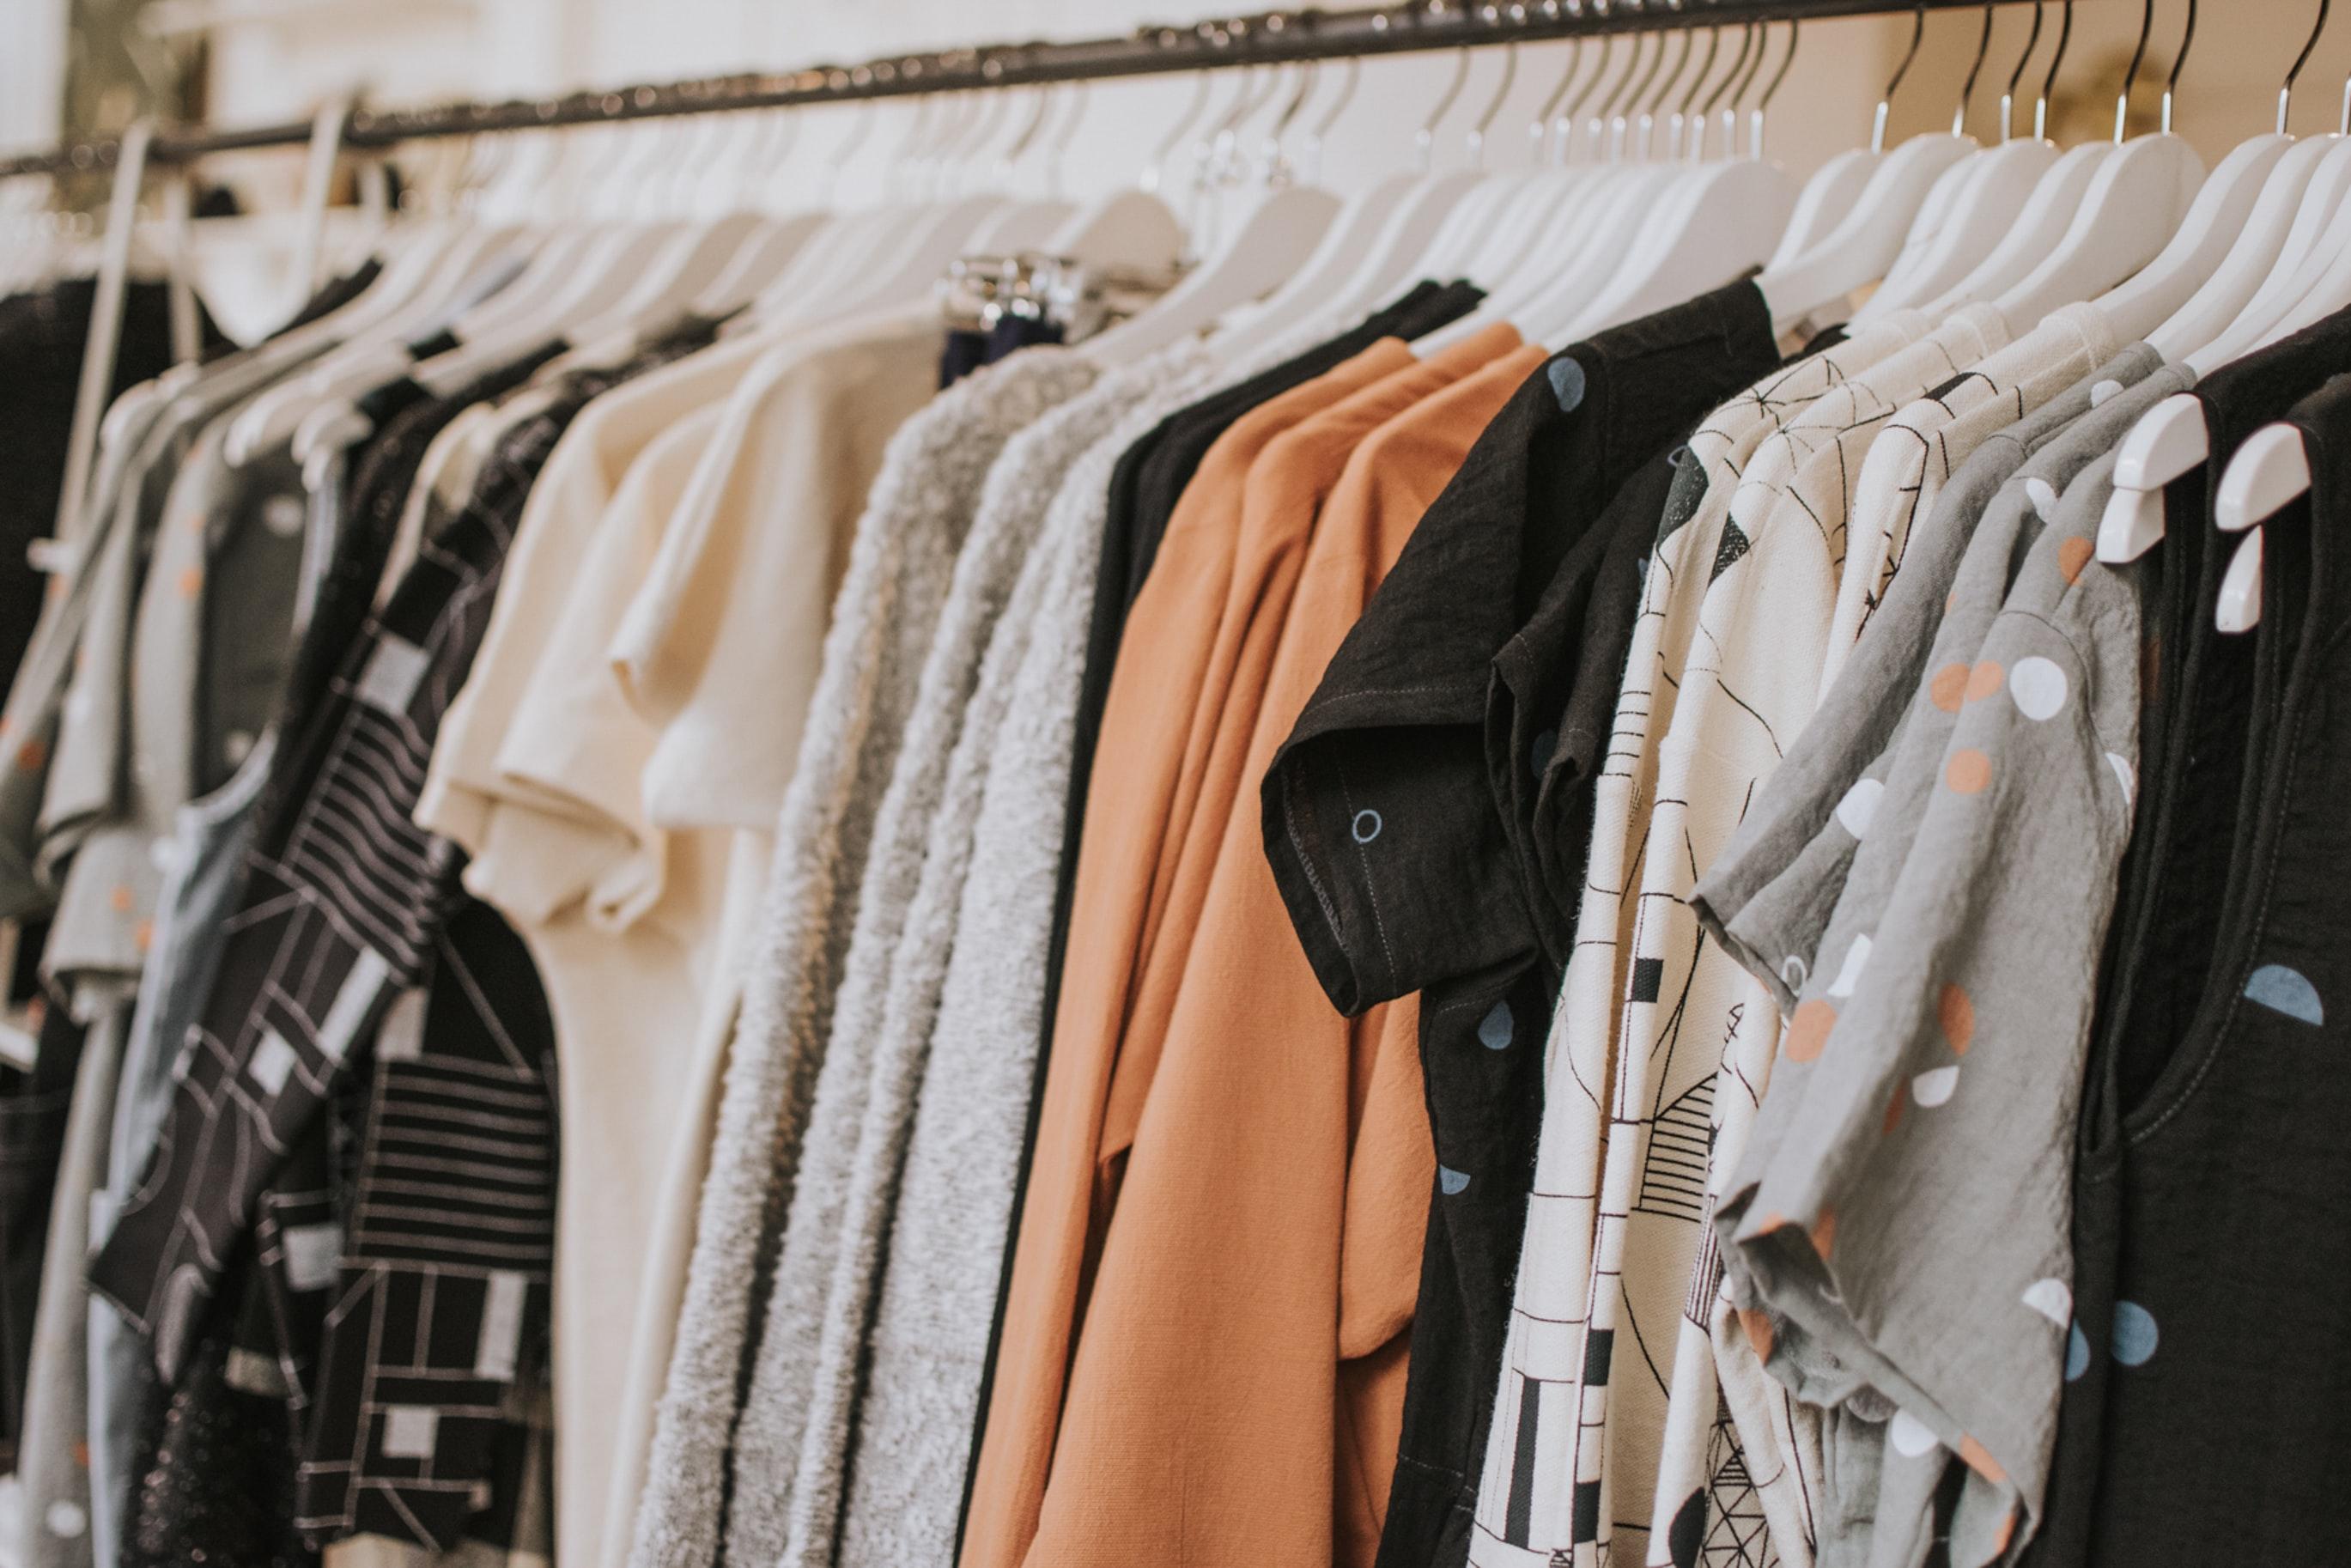 Gendersemleges divat lesz a jövő?